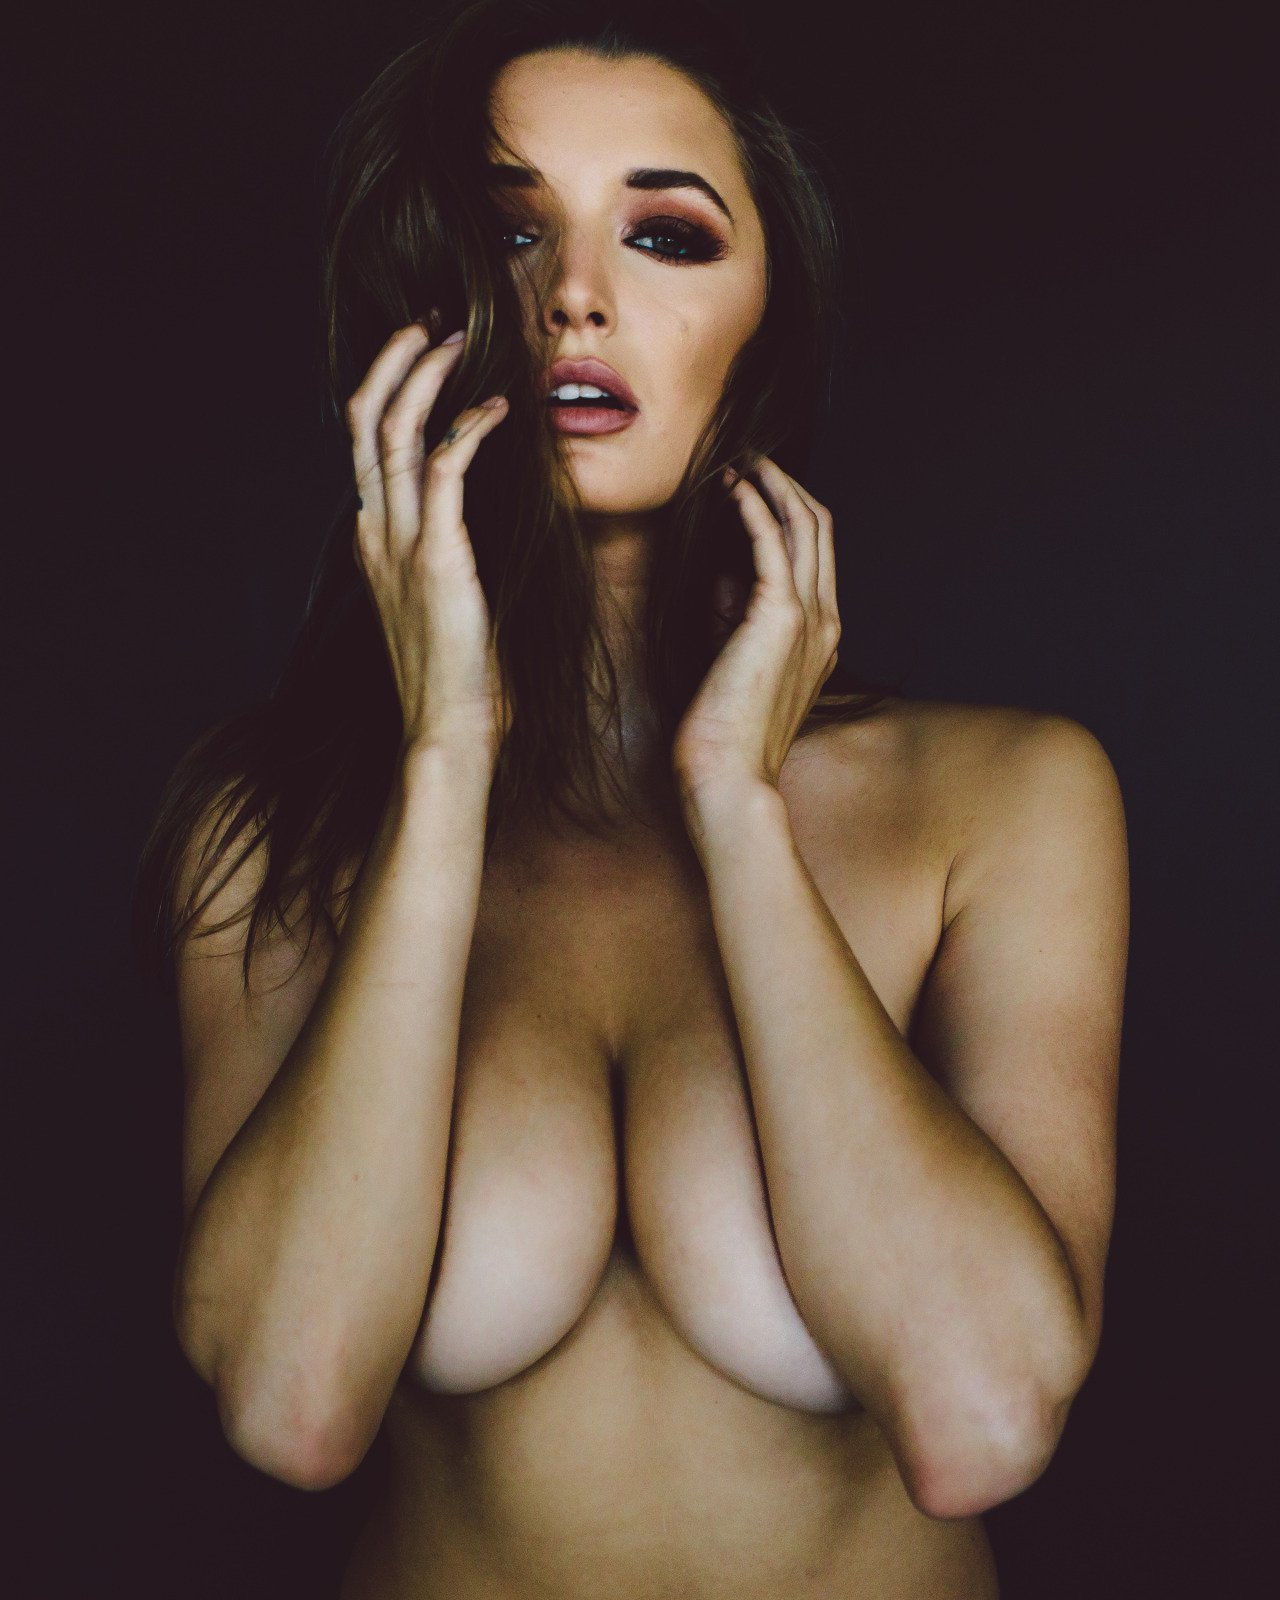 amber arbucci nude pics